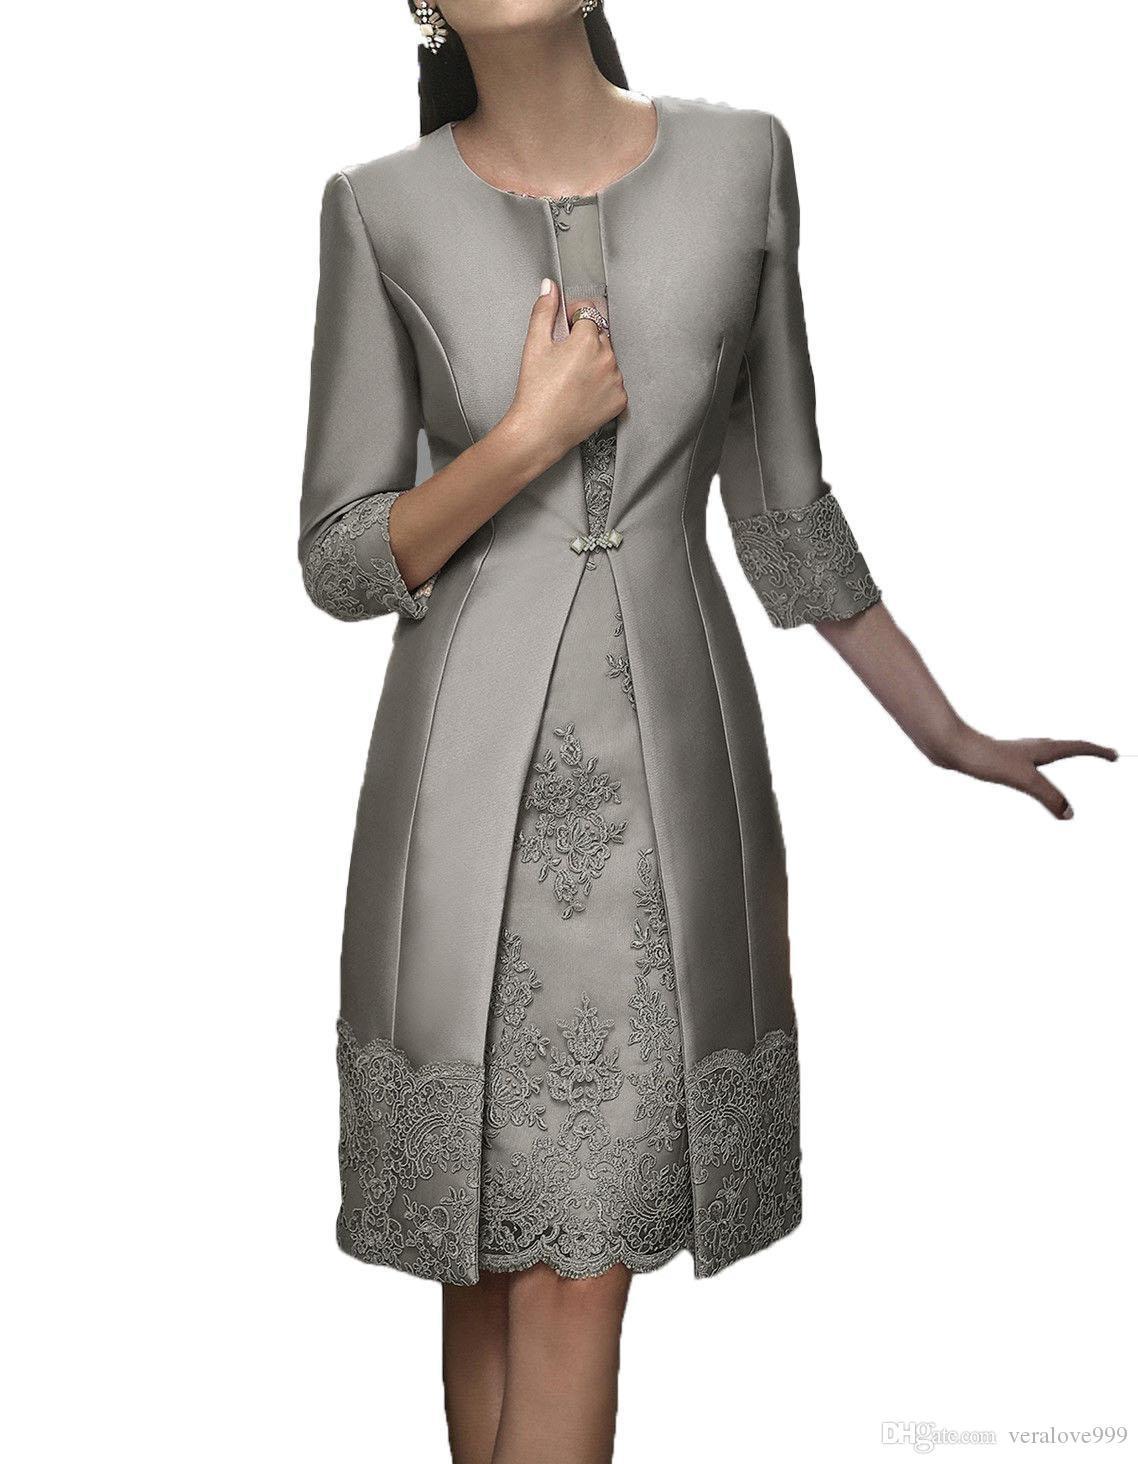 17 Genial Kleid Elegant Kurz Ärmel10 Fantastisch Kleid Elegant Kurz Bester Preis